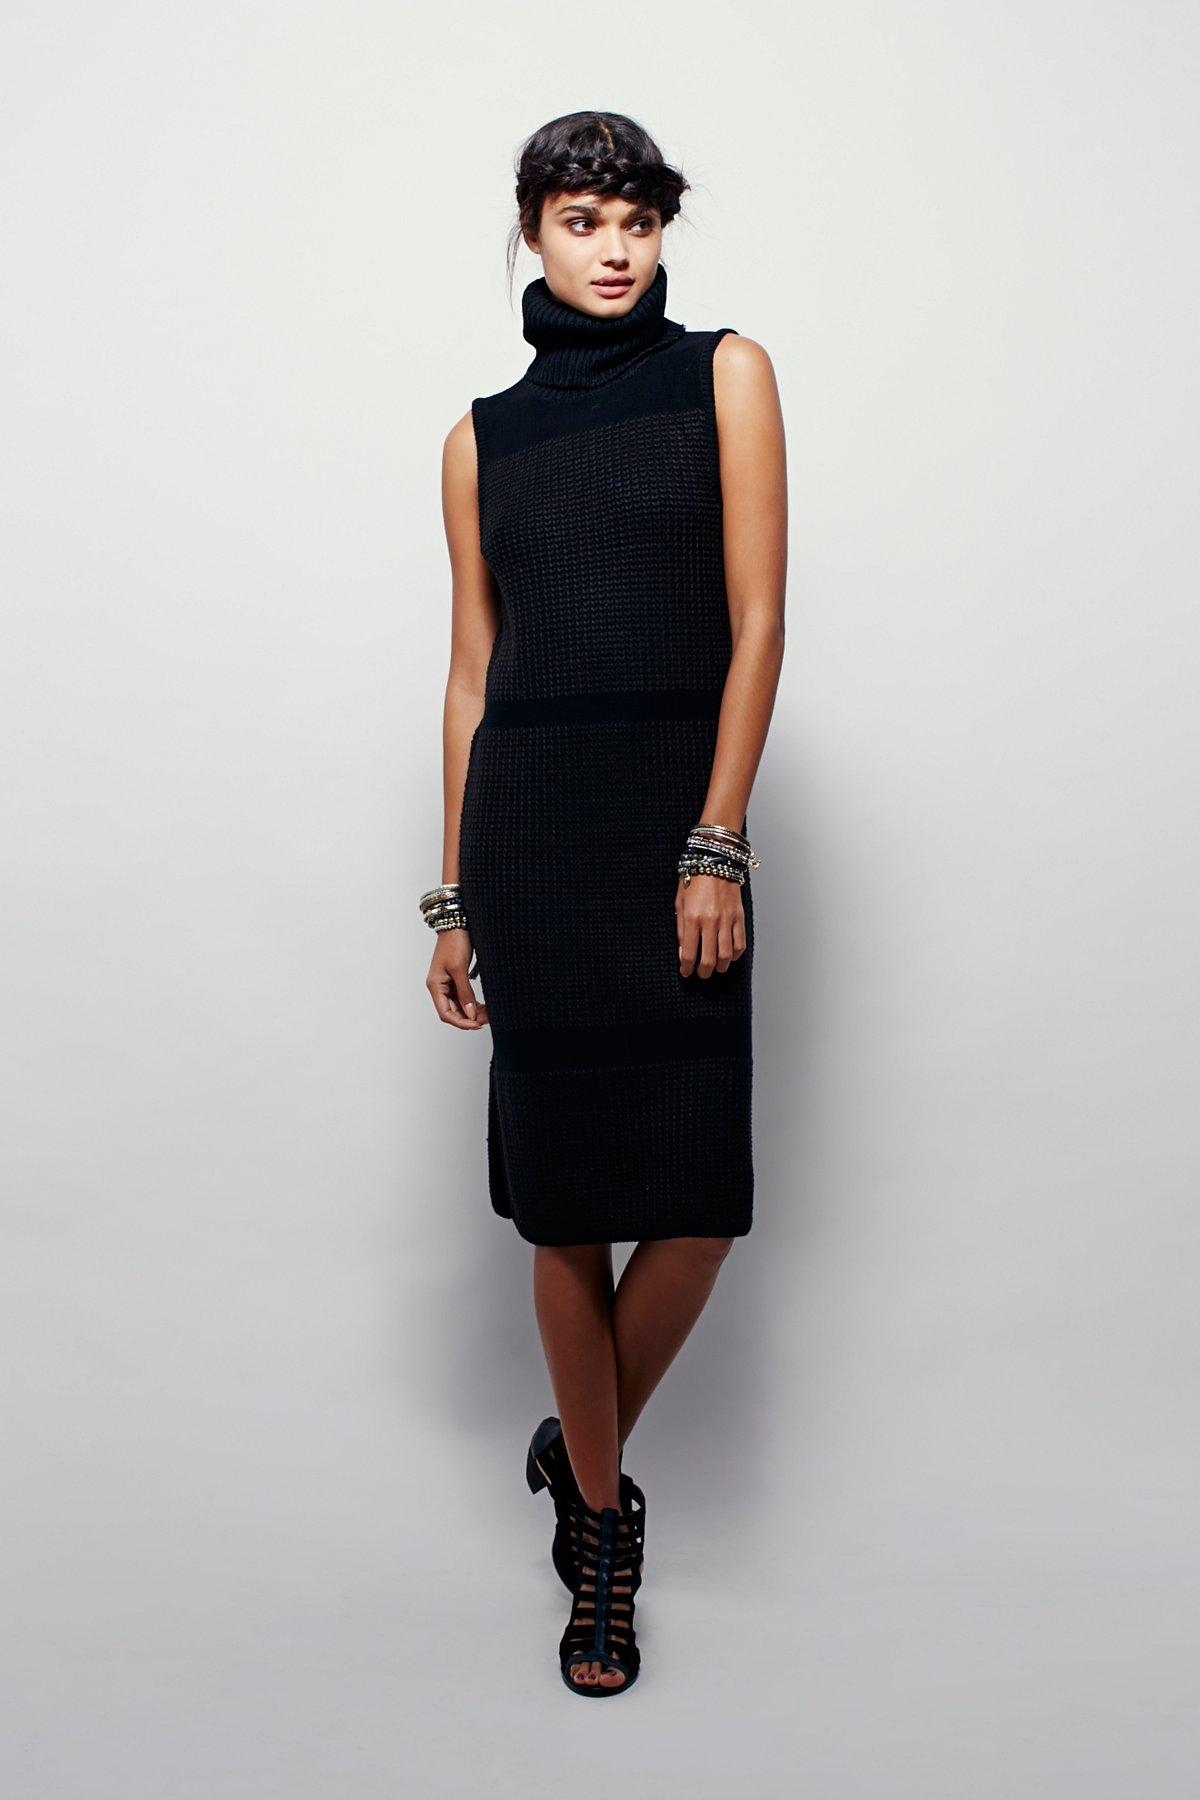 Arctic针织连衣裙